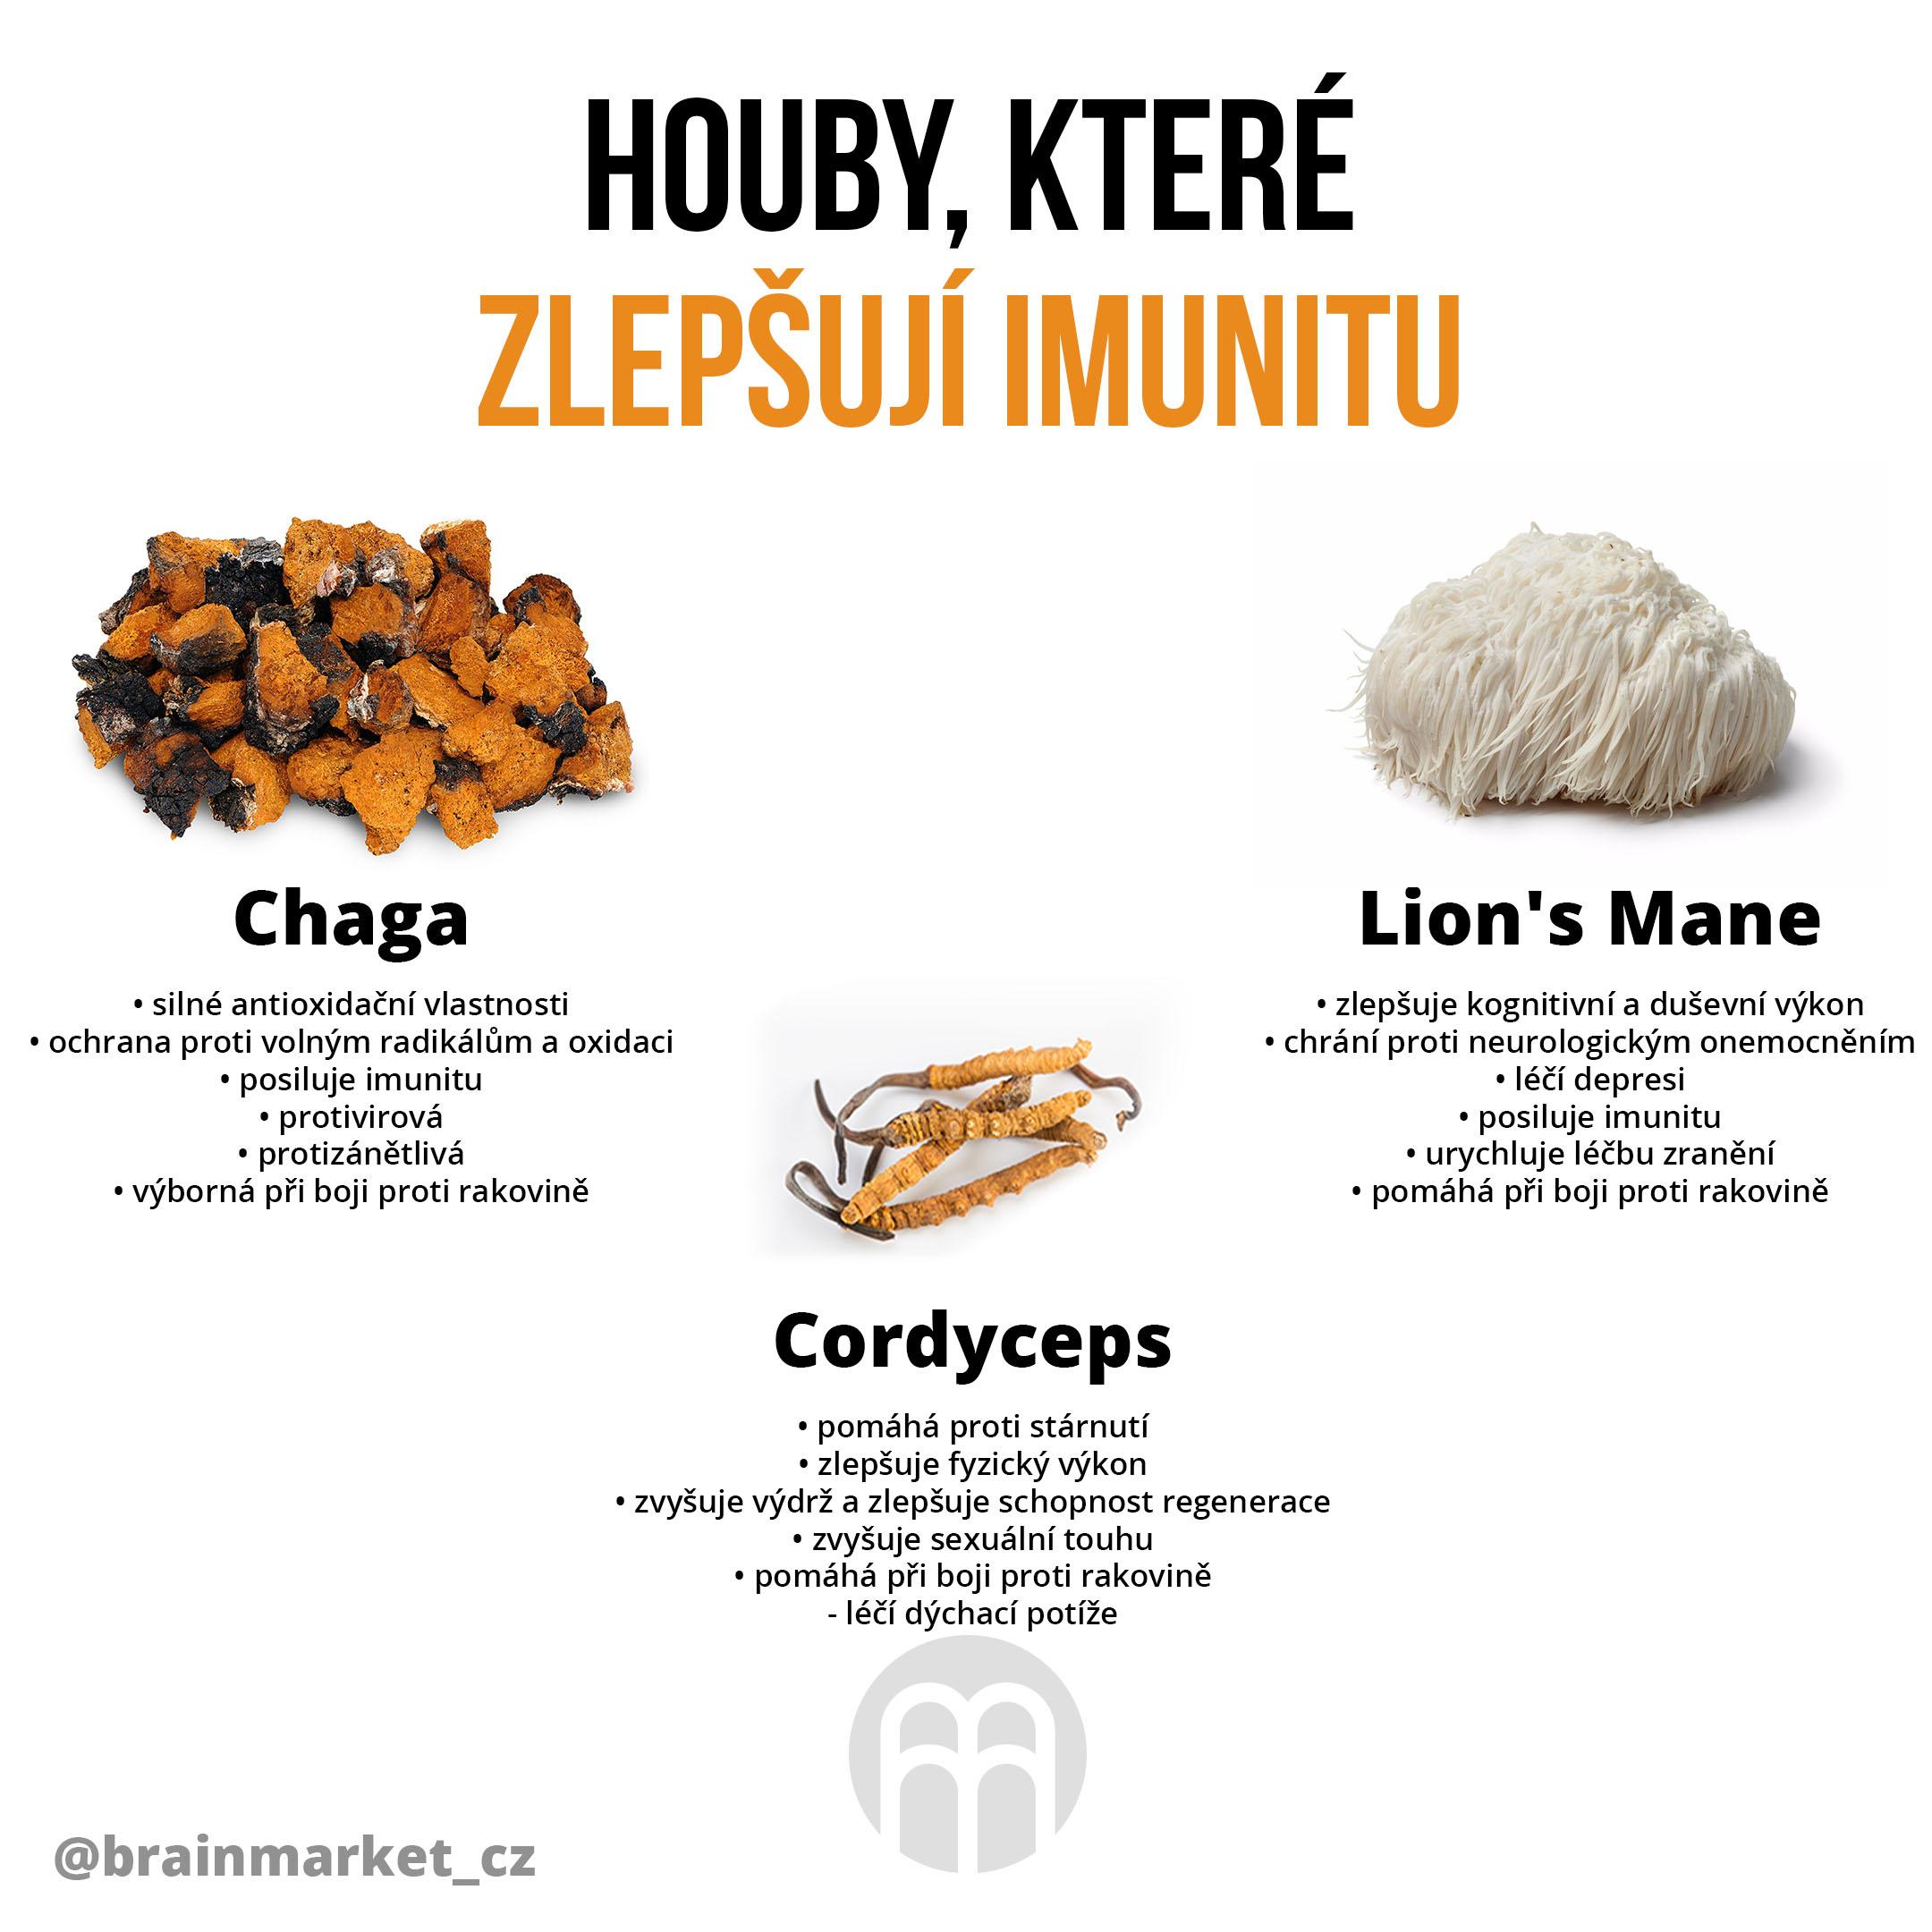 houby-ktere-zlepsuji-imunitu-brainmarket (1)